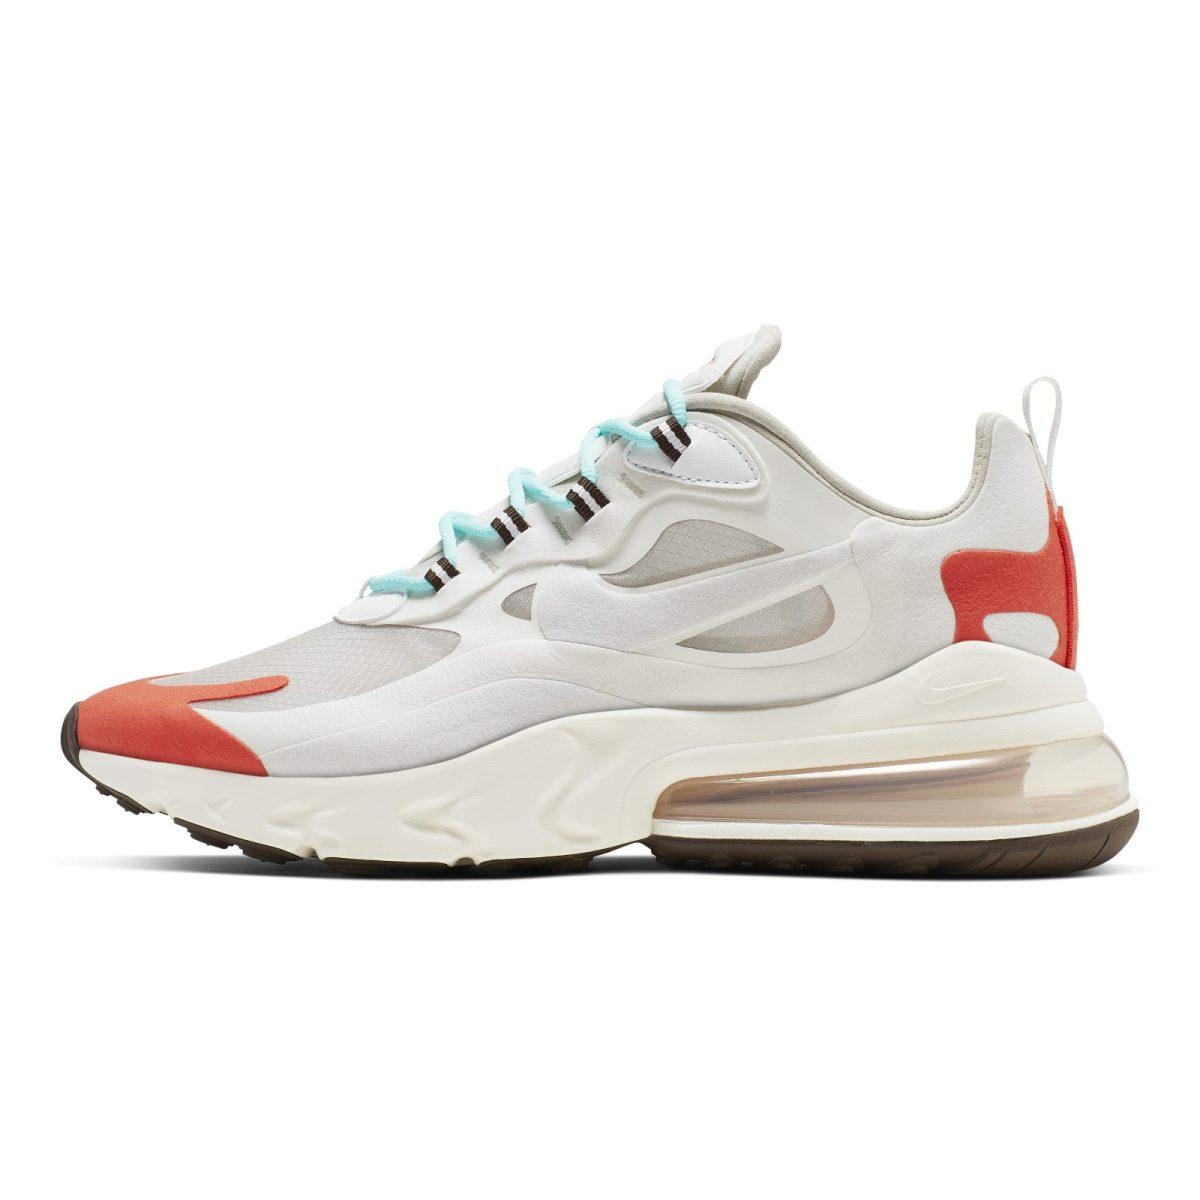 NSW Nike Air Max 270 React